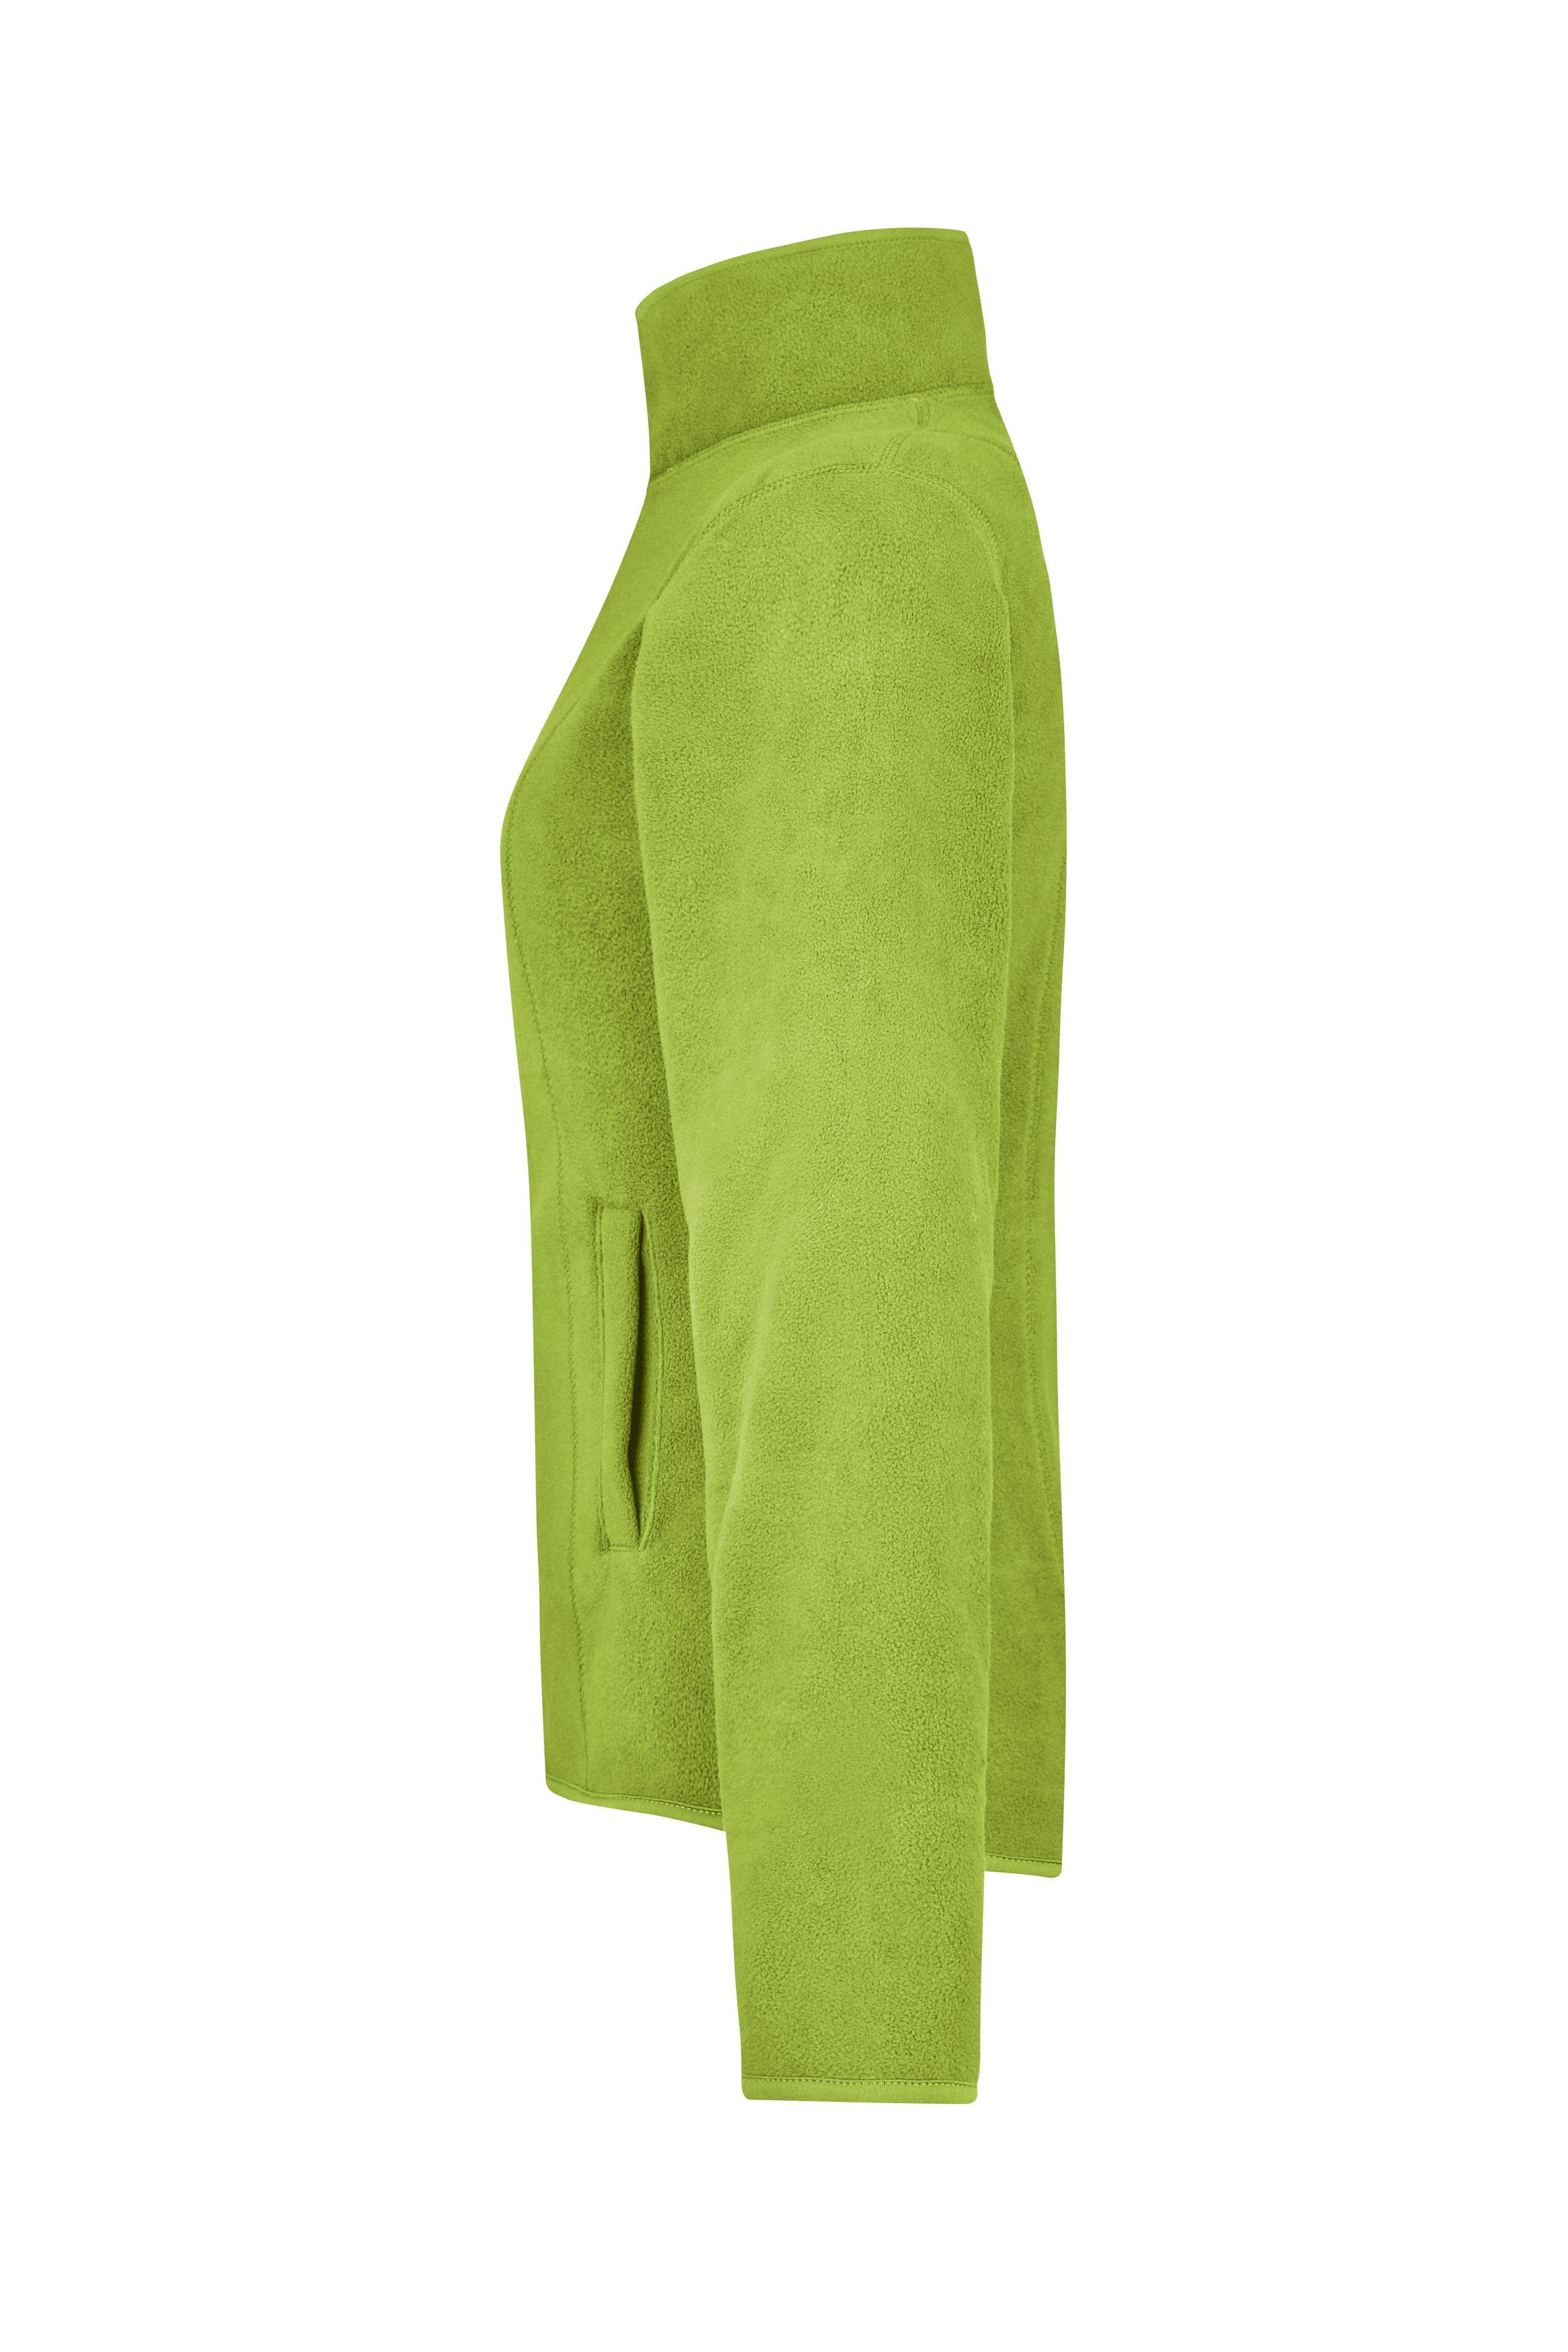 Leichte Jacke aus Microfleece